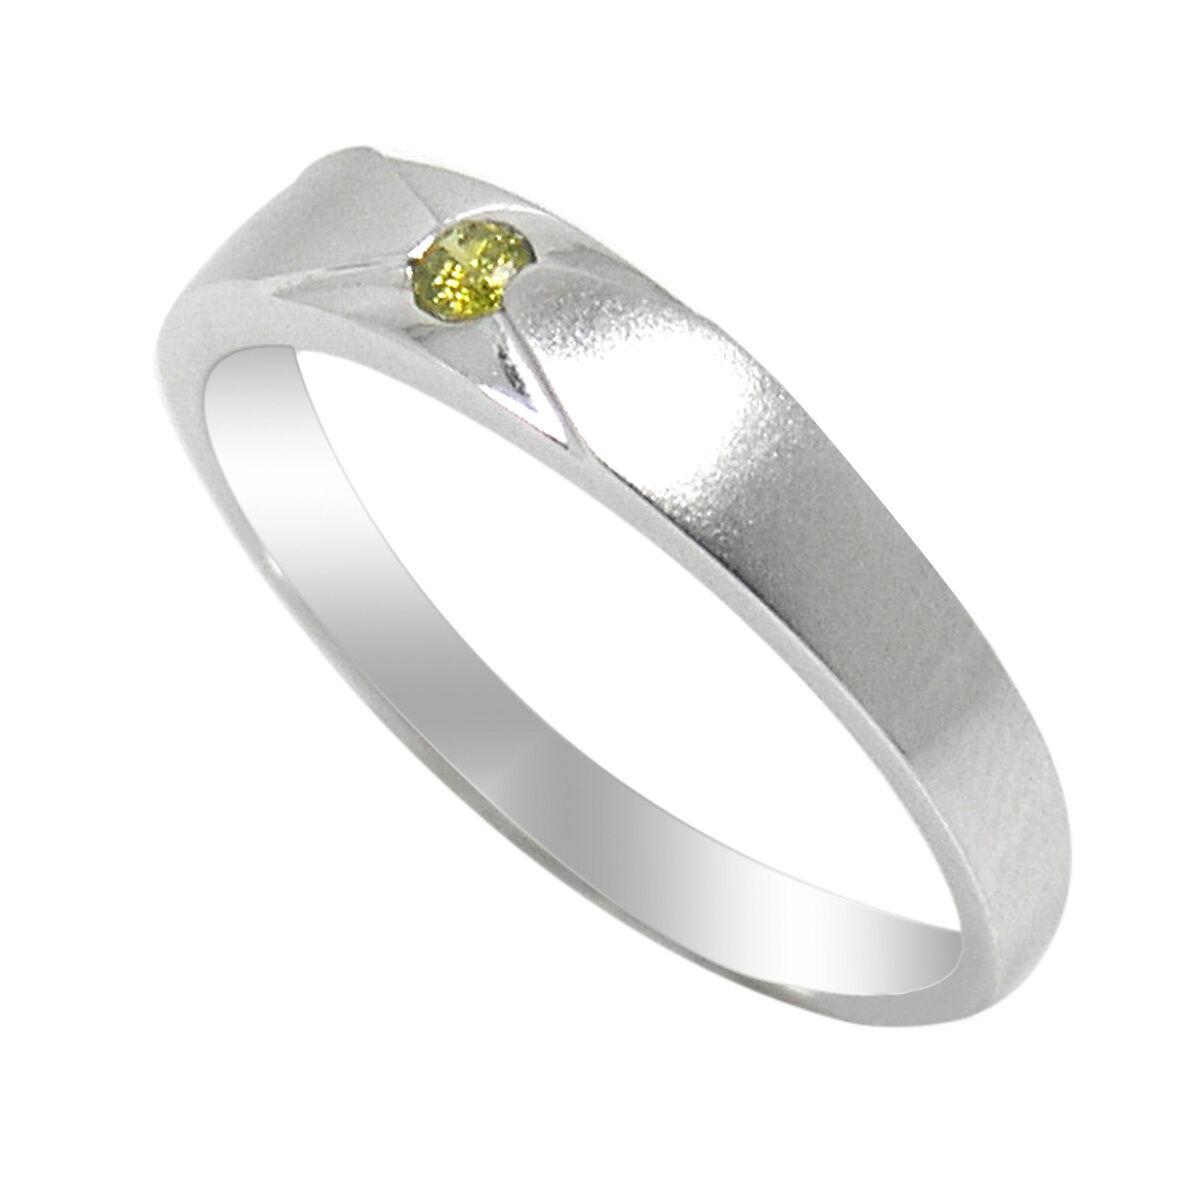 De Buman 18k White gold Diamond Solitaire Ring